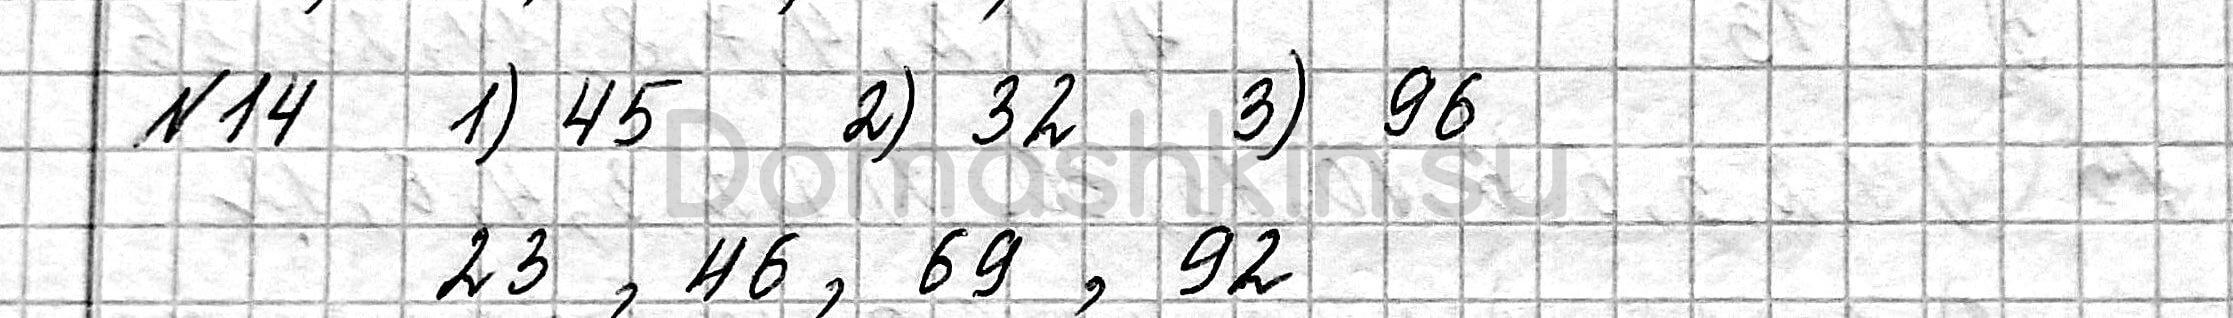 Математика 6 класс учебник Мерзляк номер 14 решение